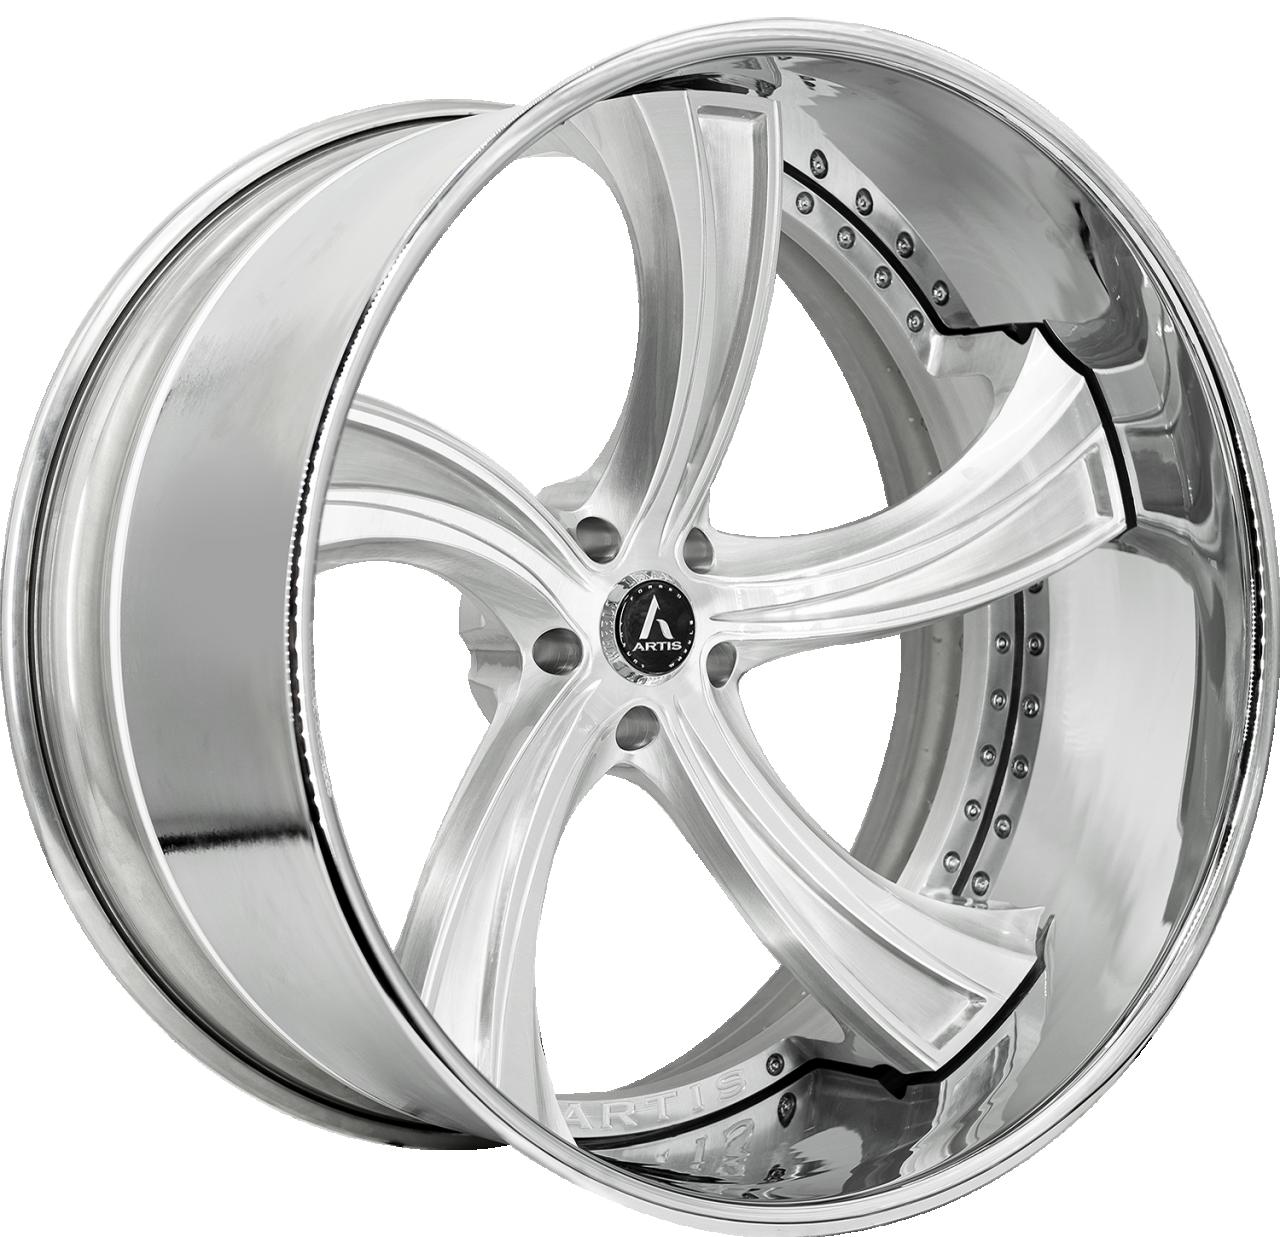 Artis Forged Kokomo wheel with Brushed finish